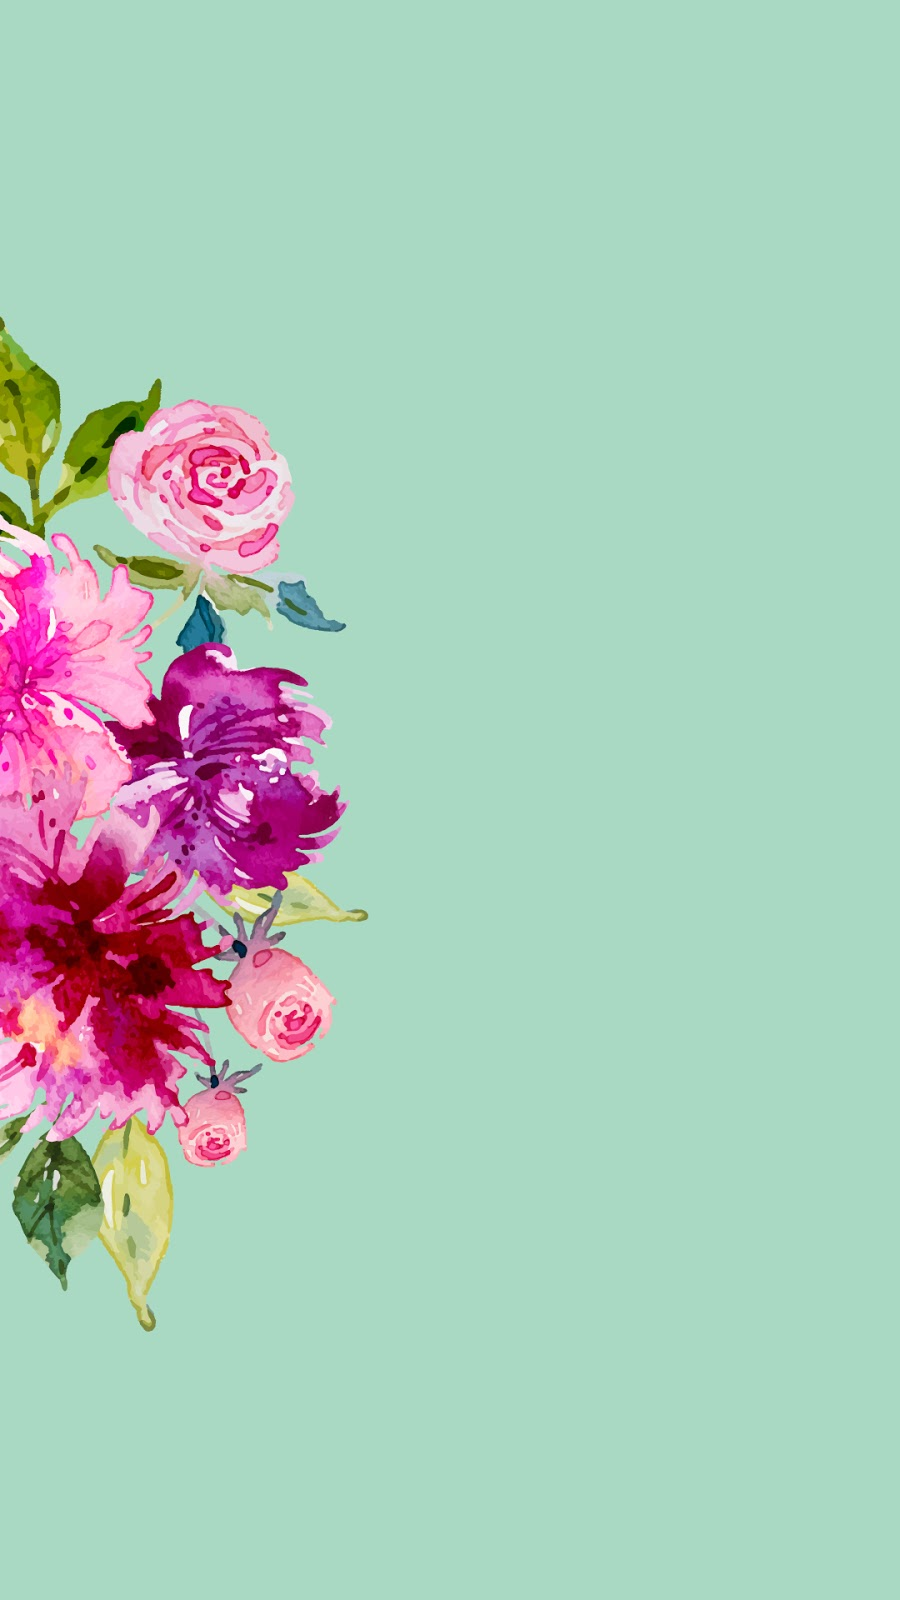 Pastel Flower Wallpaper Iphone Rolif